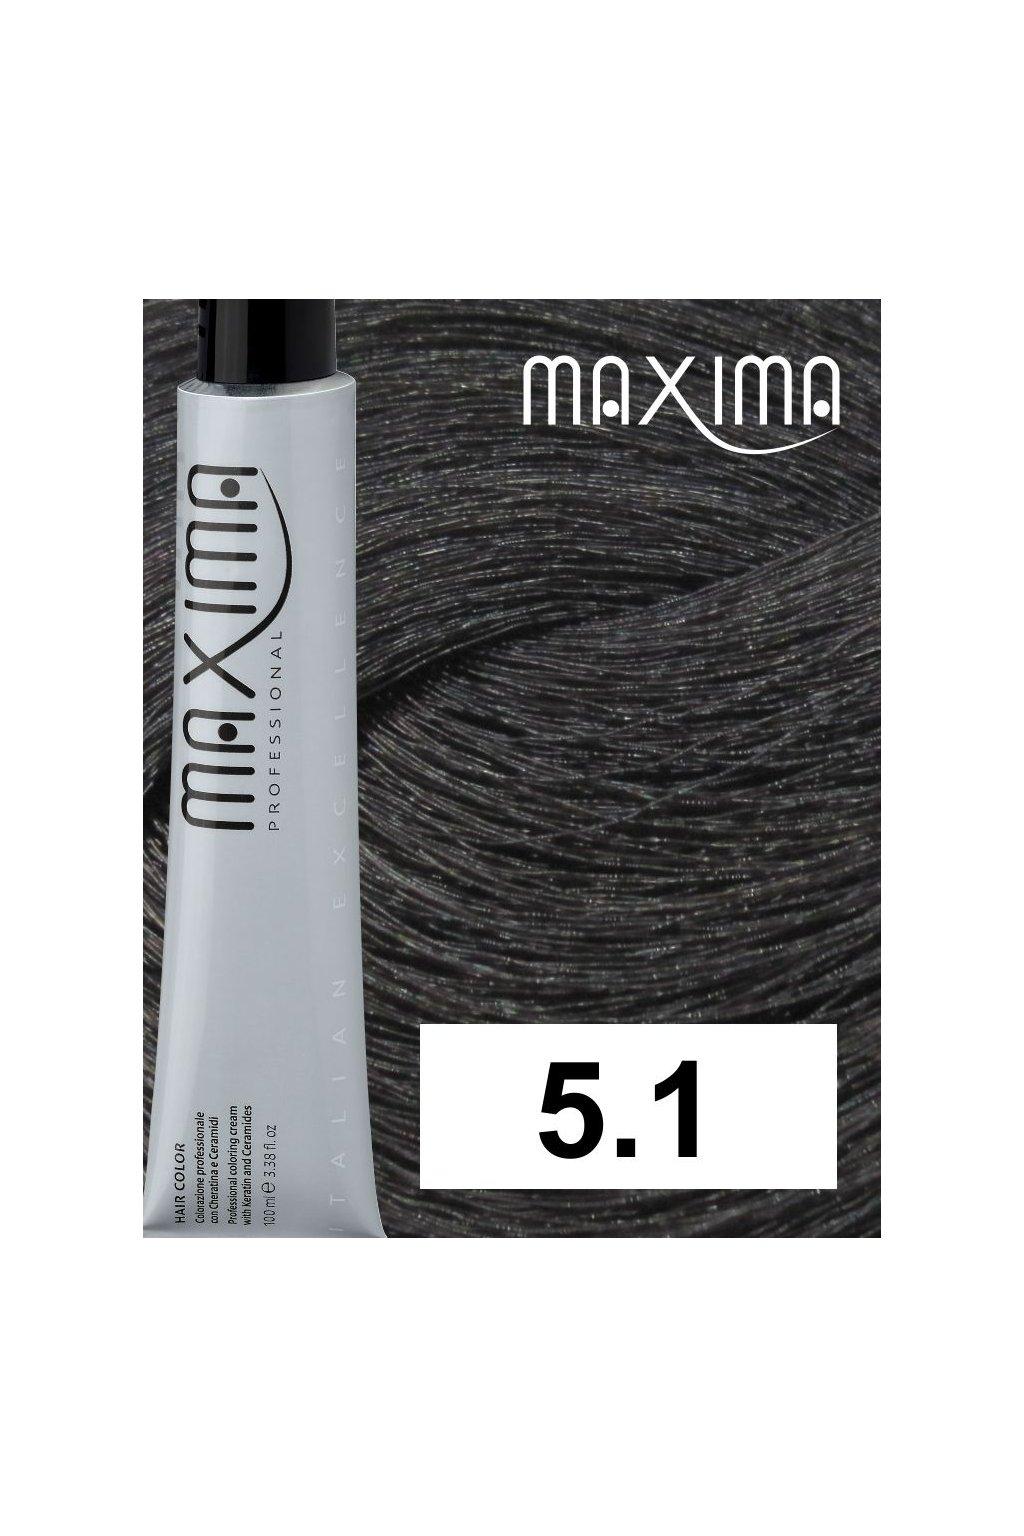 5 1 max